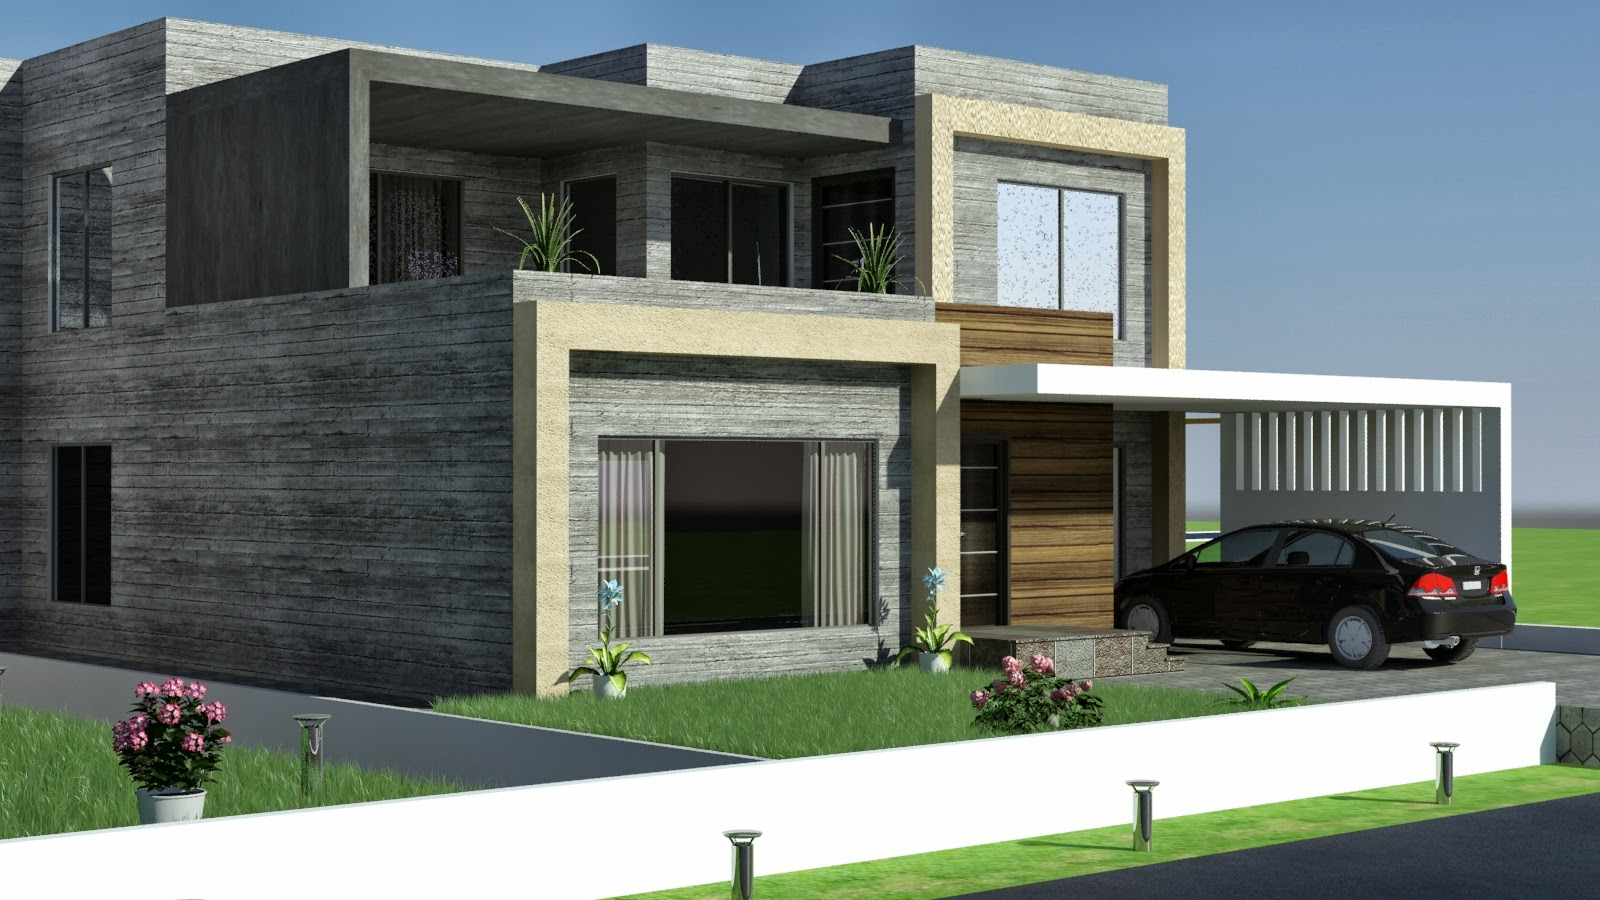 3d front 1 kkanal old design convert to - Contemporary home designs photos ...